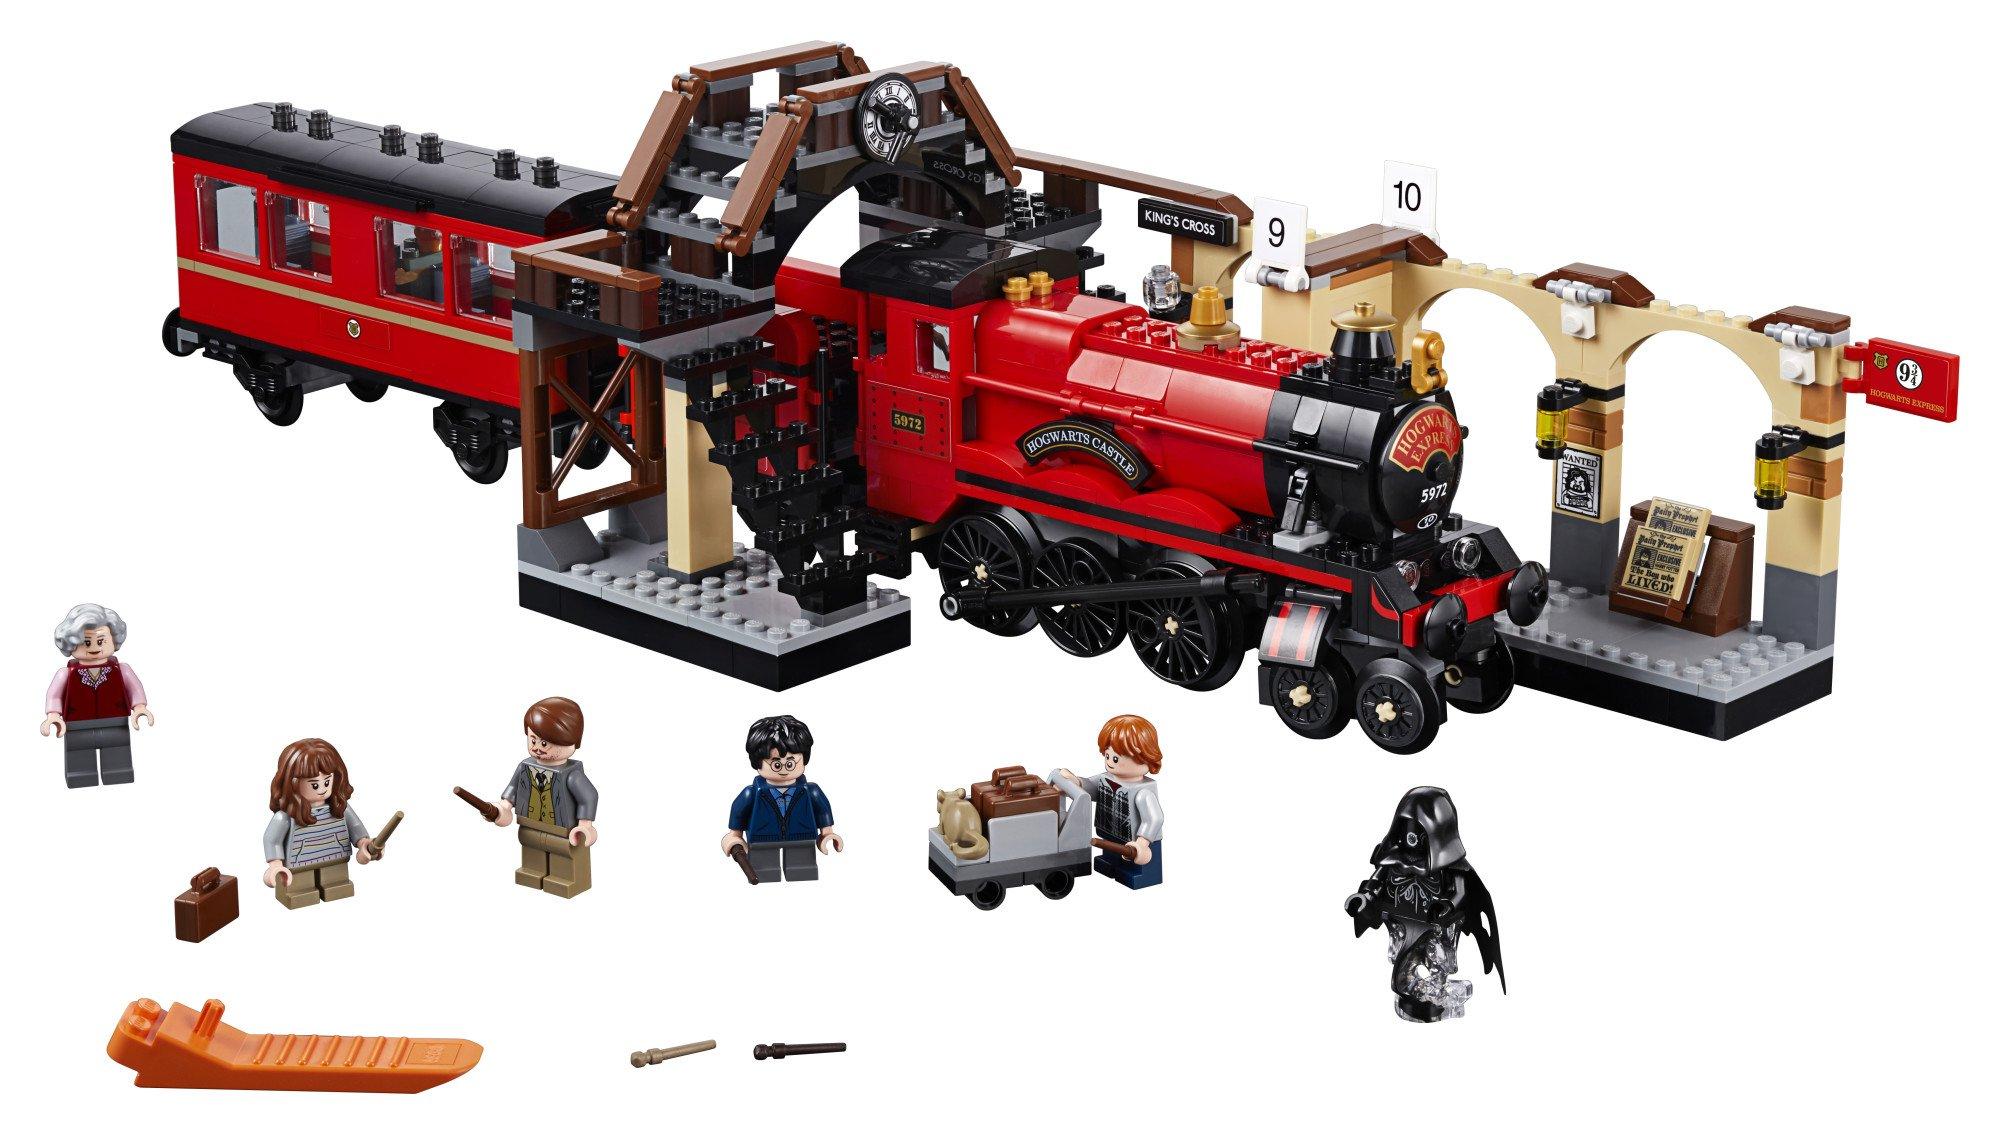 Harry Potter Lego Train Set - Hogwarts Express 75955 Building Kit